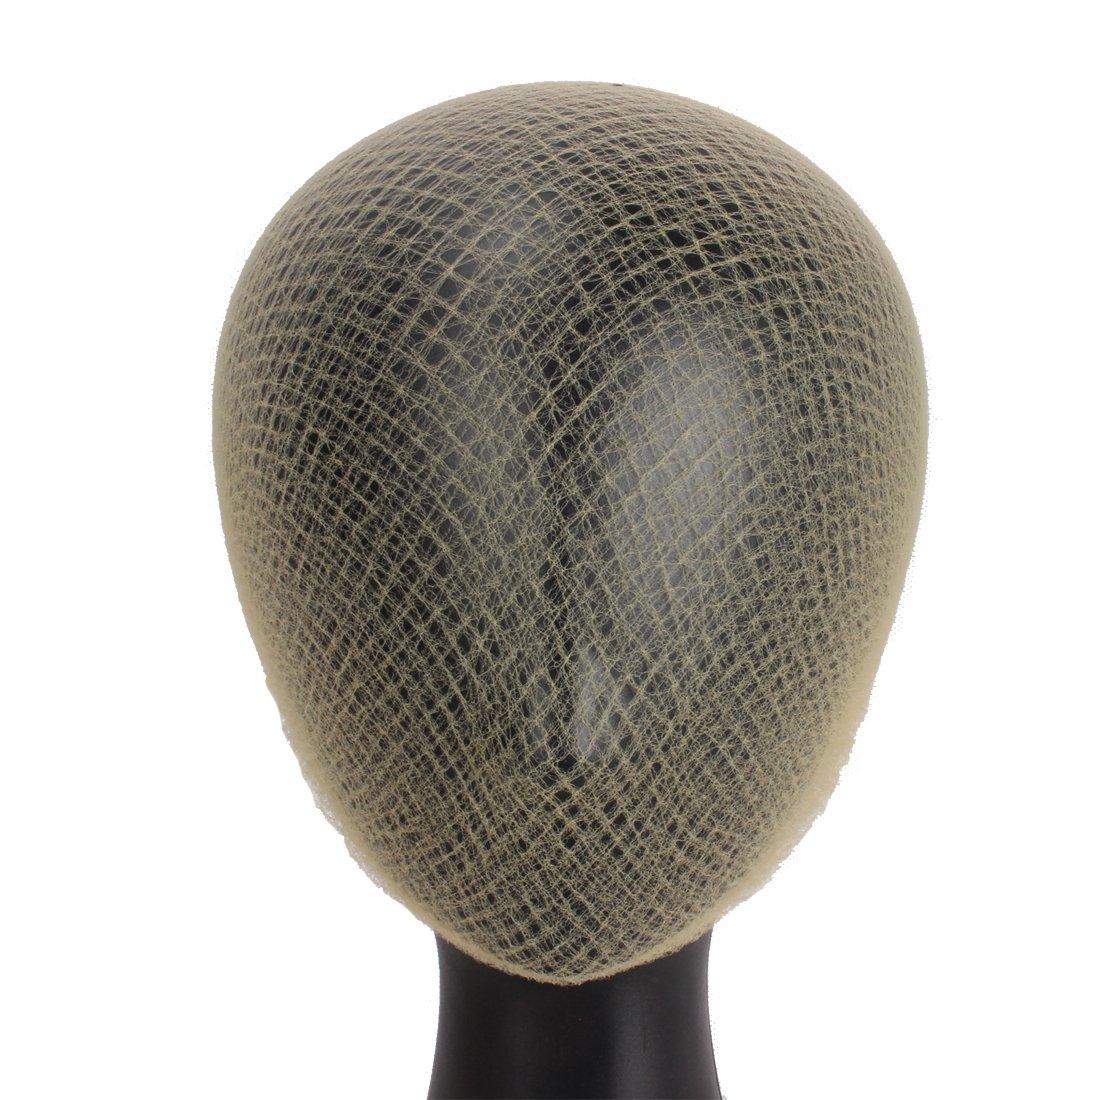 Generic Pack of 100pcs Hair Nets Invisible Elastic Edge Mesh 50cm Blonde Yiwu Zhongken Trading Co. Ltd. COMINHKPR89412